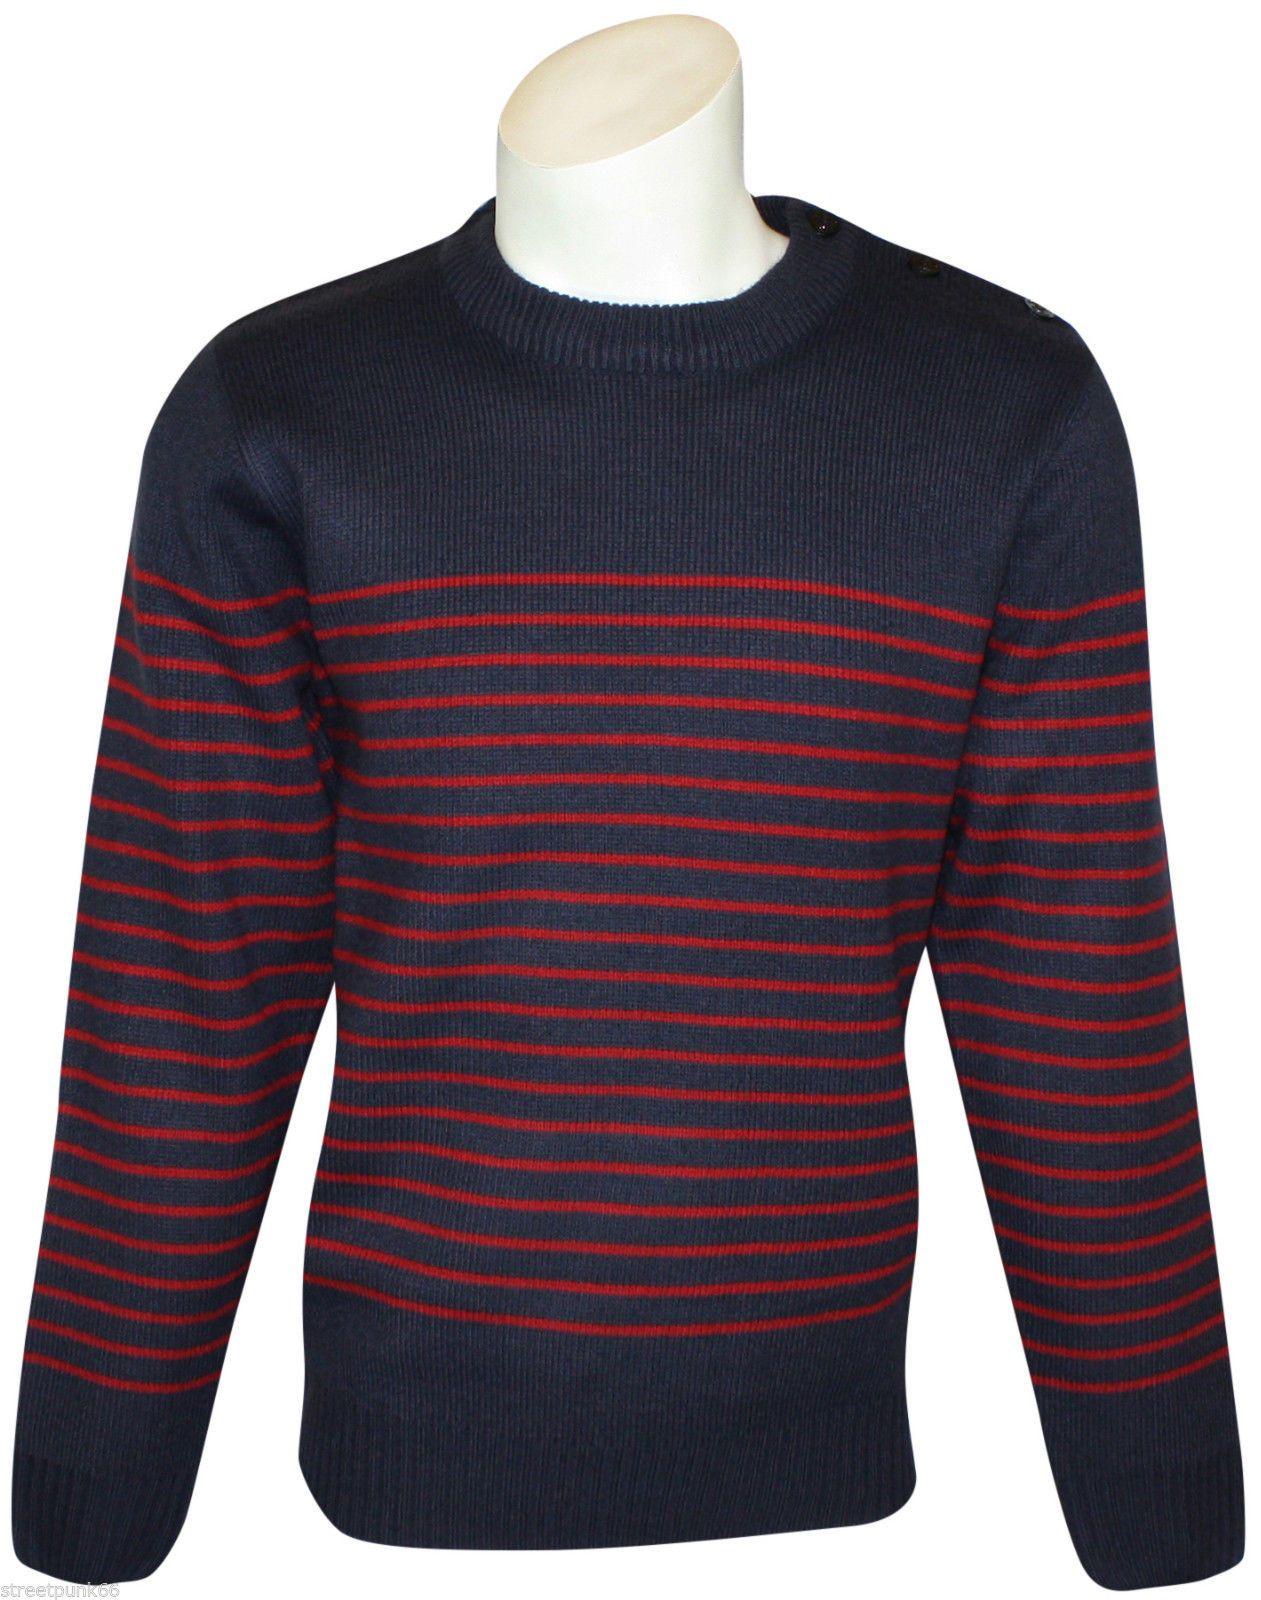 Relco Mens Mod Striped Naval Navy Blue Guernsey Knit Jumper Retro ...